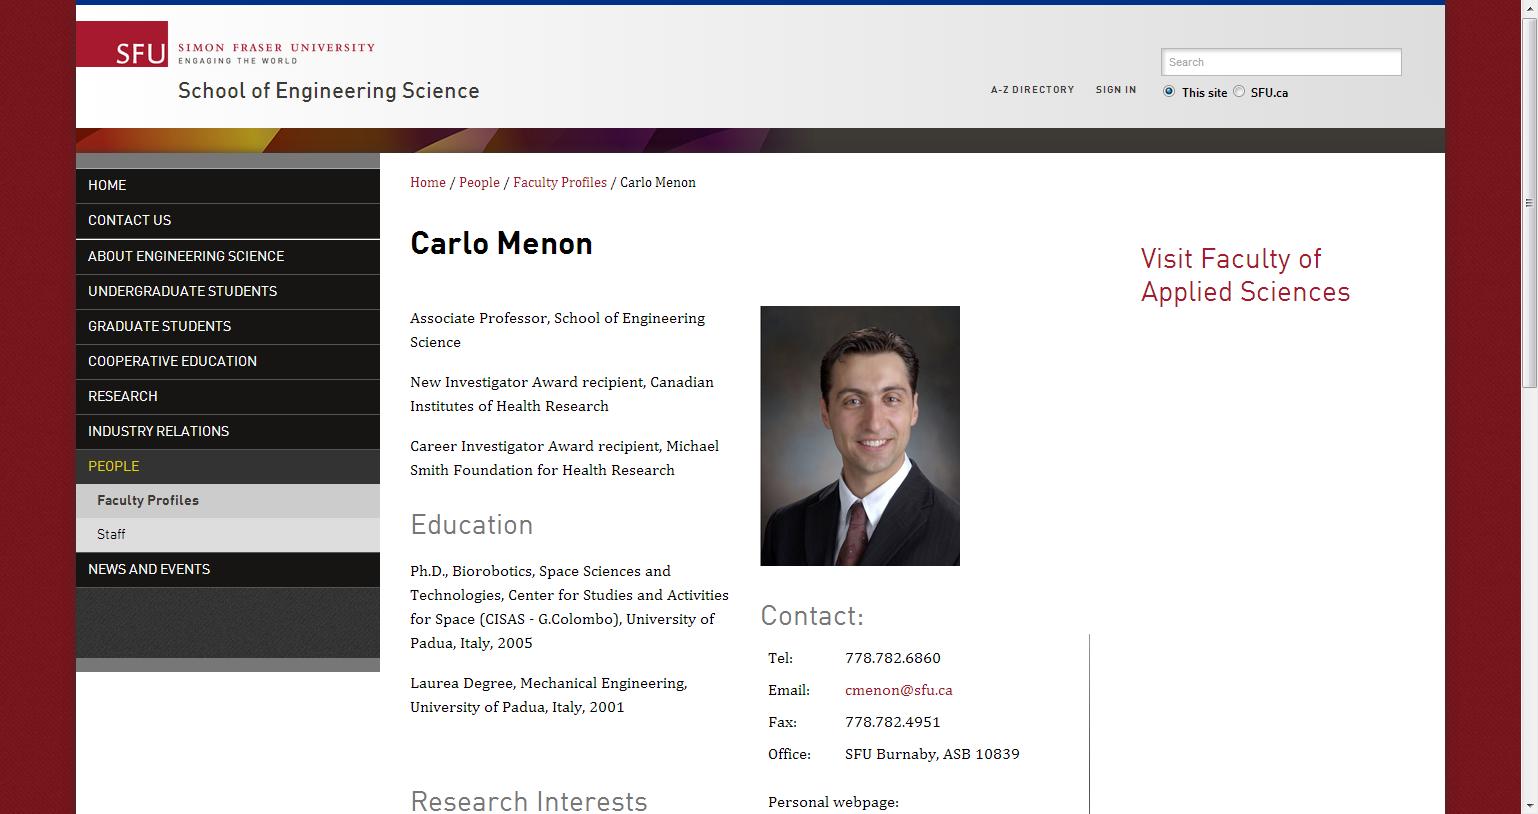 Carlo Menon - School of Engineering Science - Simon Fraser University